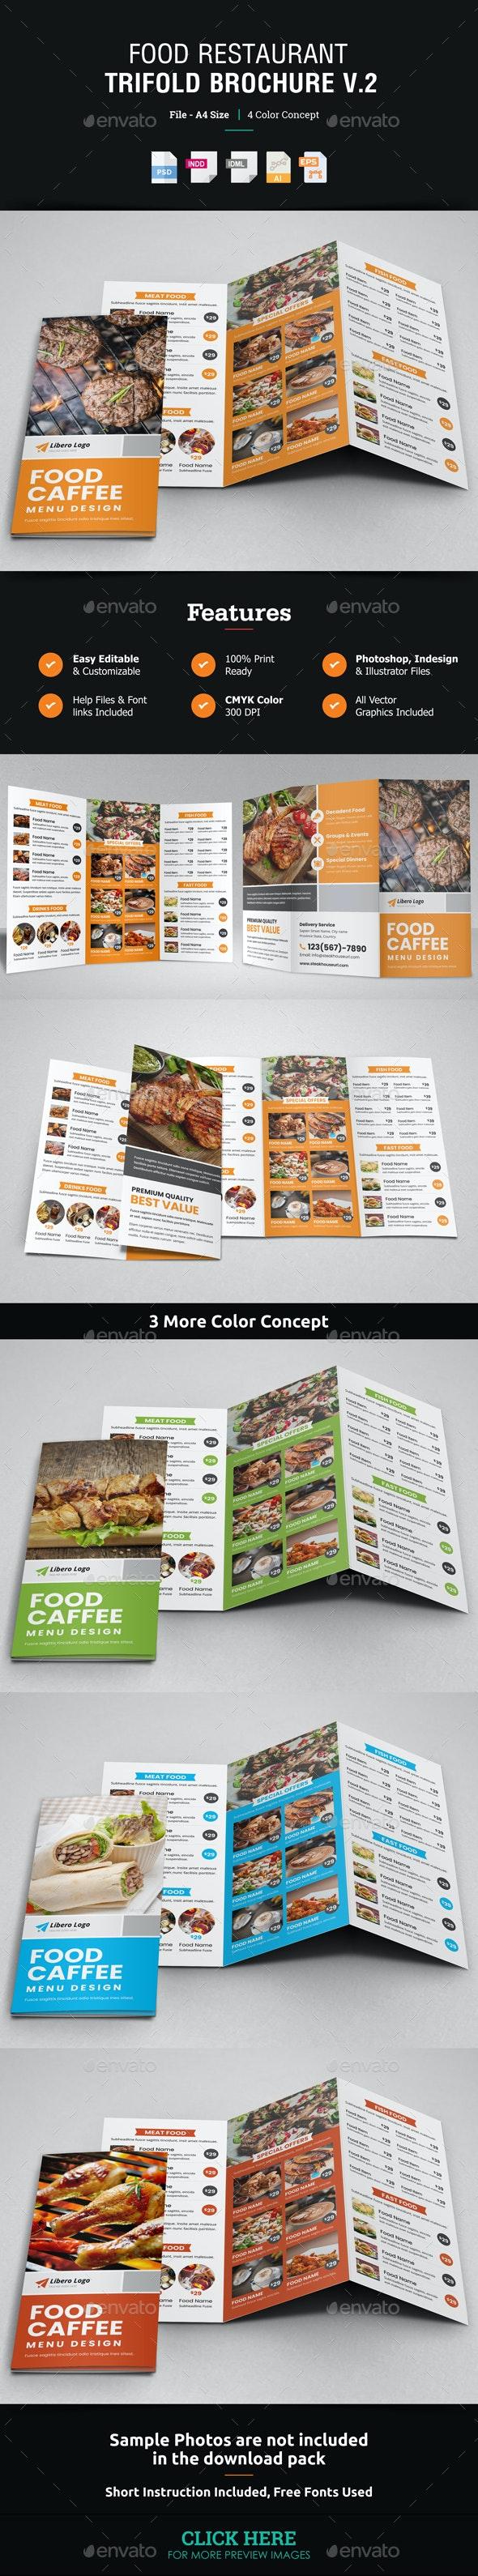 Food Restaurant Trifold Brochure v2 - Catalogs Brochures